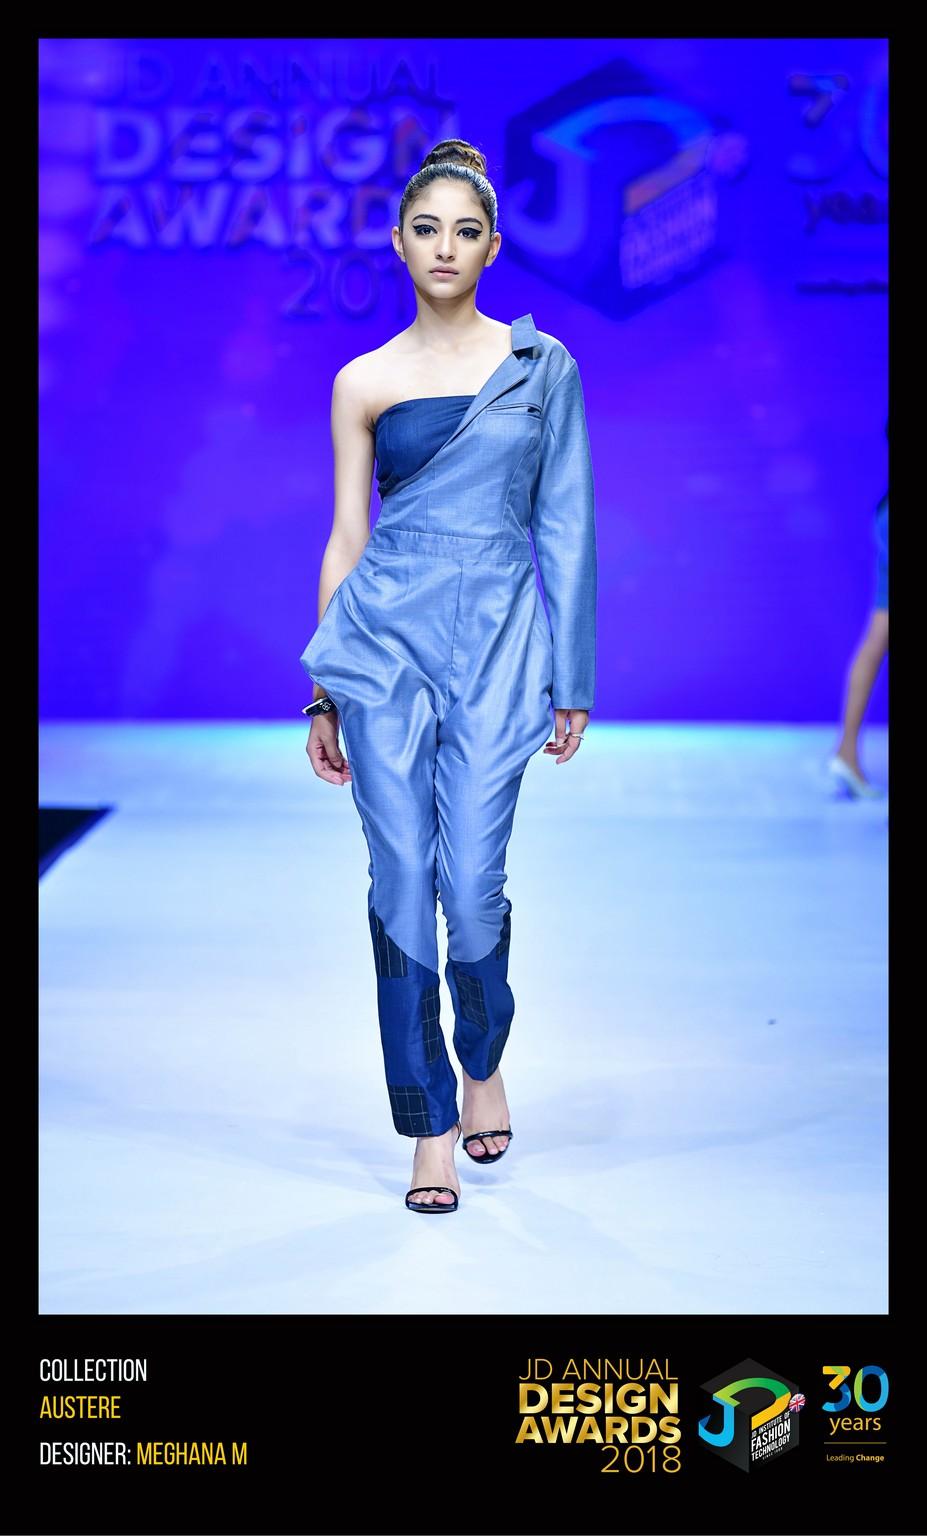 Austere – Change – JD Annual Design Awards 2018 | Designer: Meghana | Photography : Jerin Nath (@jerin_nath) austere - AUSTERE5 - Austere – Change – JD Annual Design Awards 2018